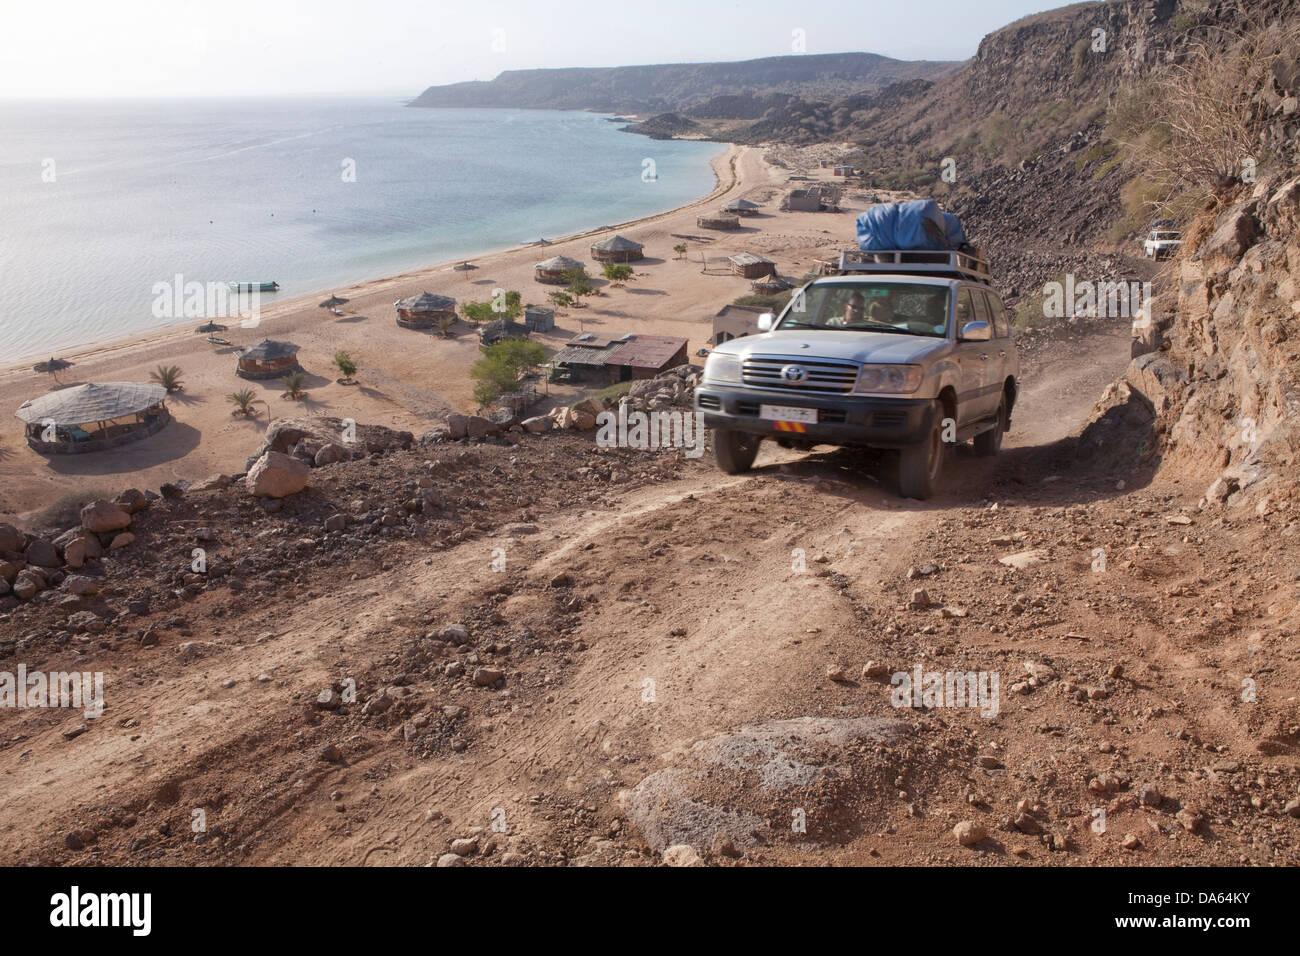 Sable Blanc, Dajoura, Red Sea, Africa, tourism, Djibouti, coast, cross-country, vehicle, car, automobile, - Stock Image